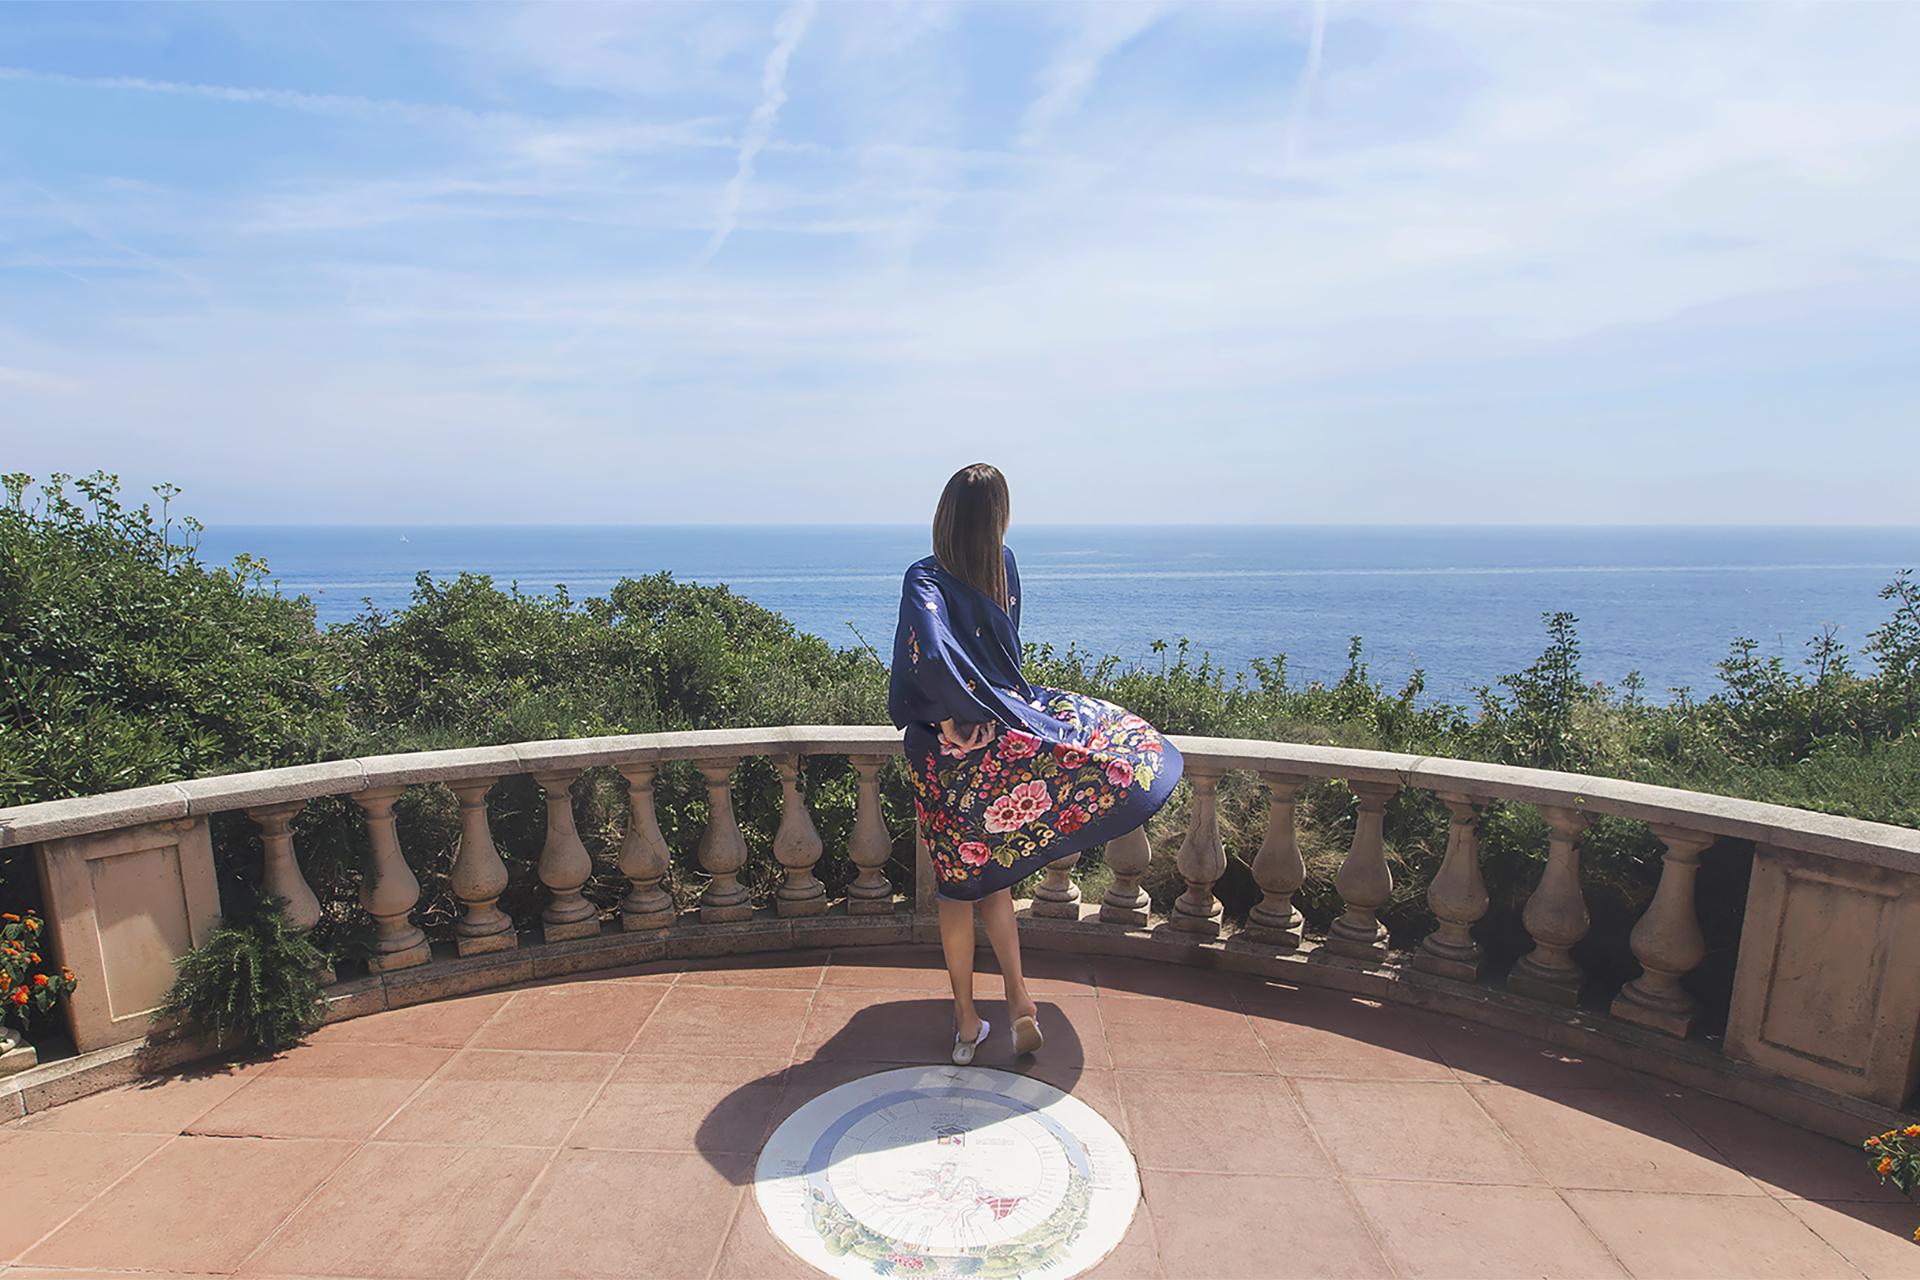 French Riviera views from Grand-Hotel du Cap-Ferrat a Four Seasons Hotel